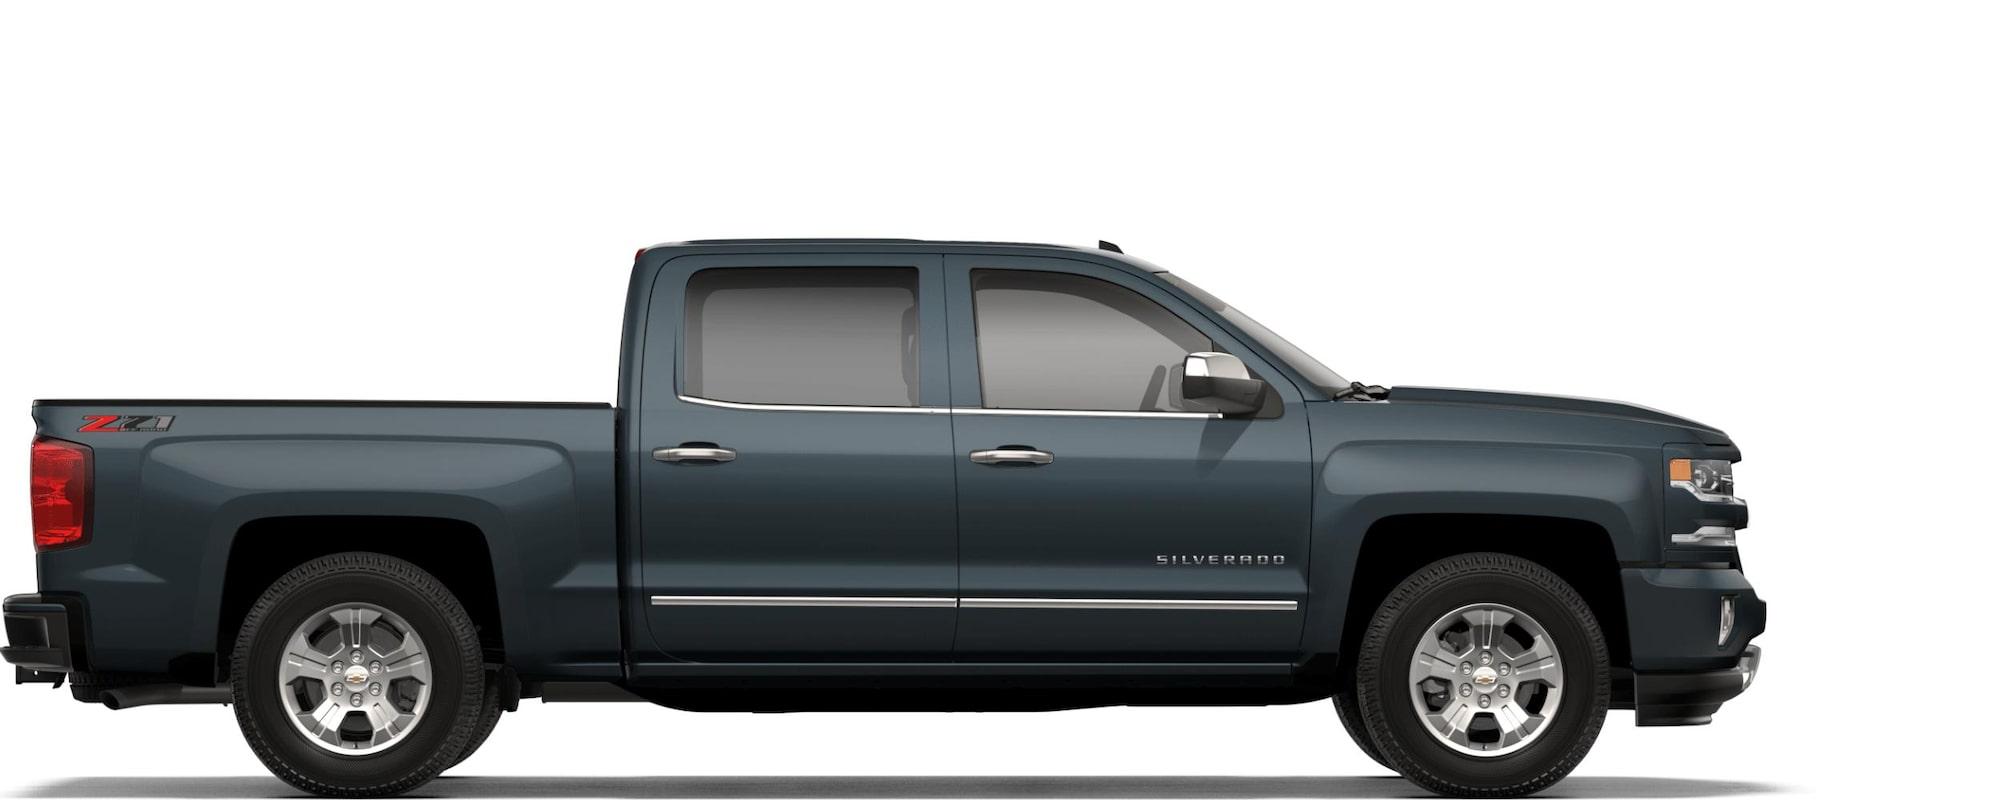 all new 2019 silverado 1500 pickup truck full size truck rh chevrolet com 2018 silverado 1500 colors 2018 silverado 2500 colors